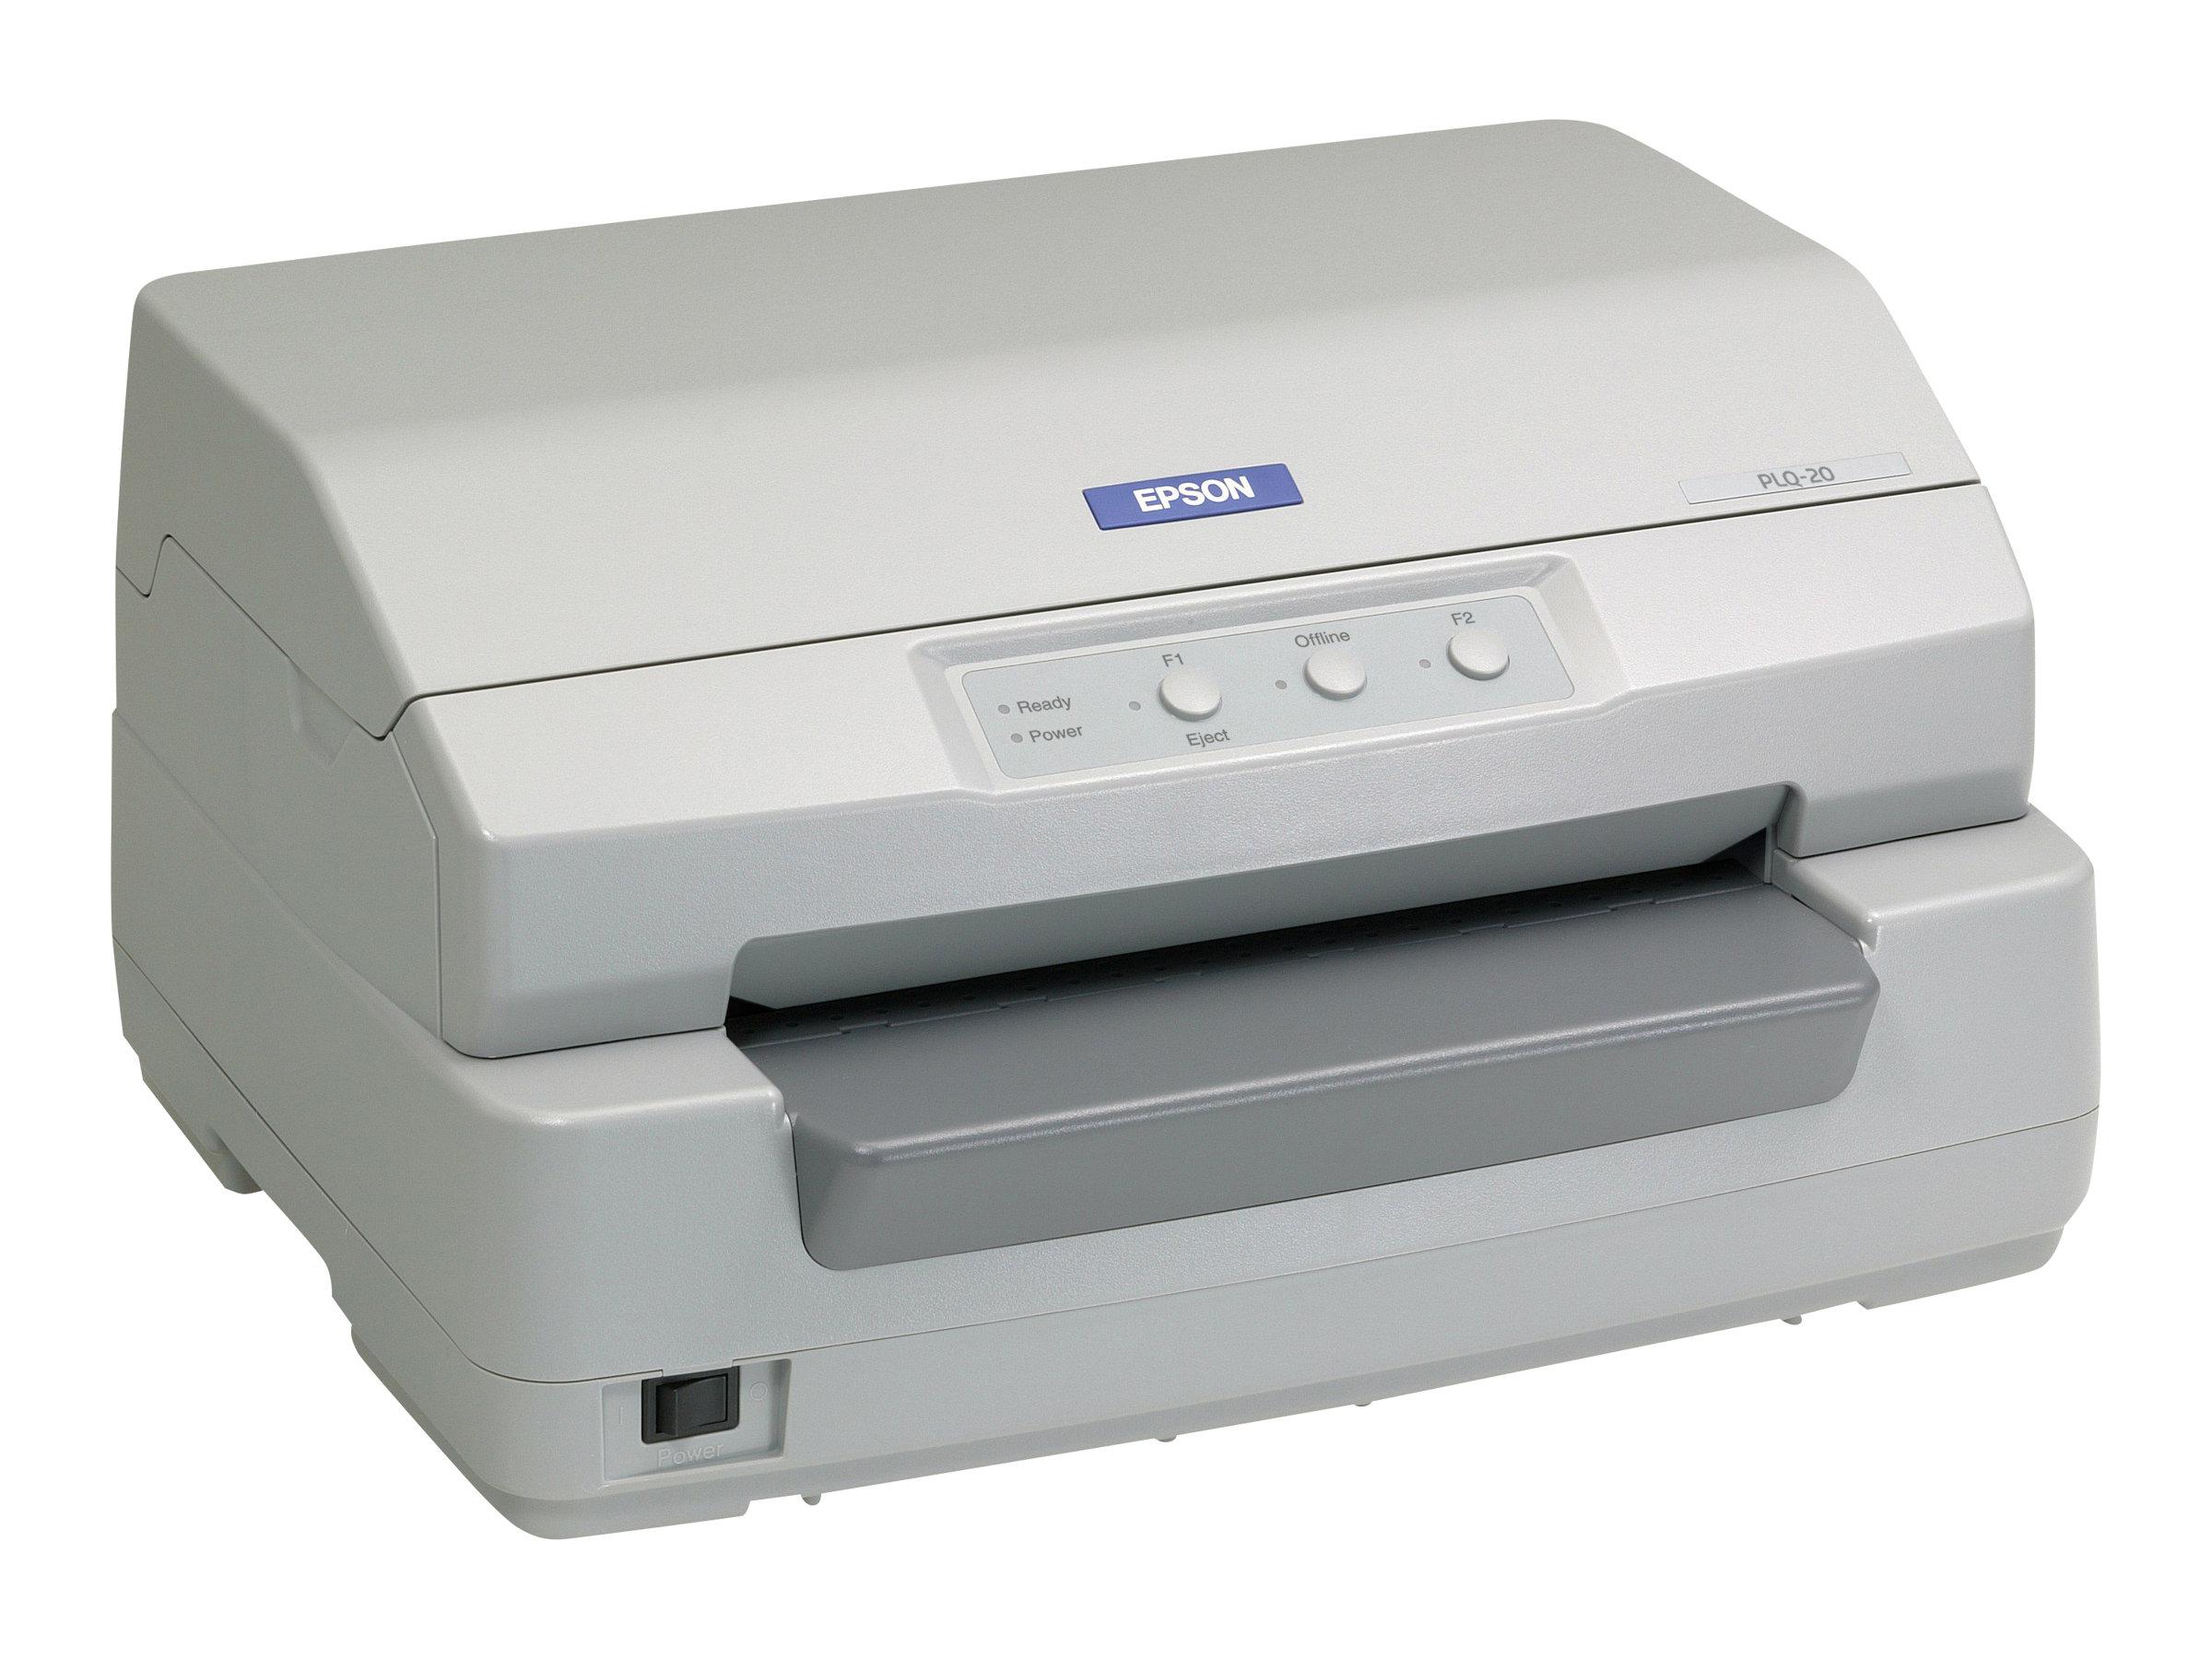 Epson PLQ 20M - Sparbuchdrucker - monochrom - Punktmatrix - 245 x 297 mm - 24 Pin